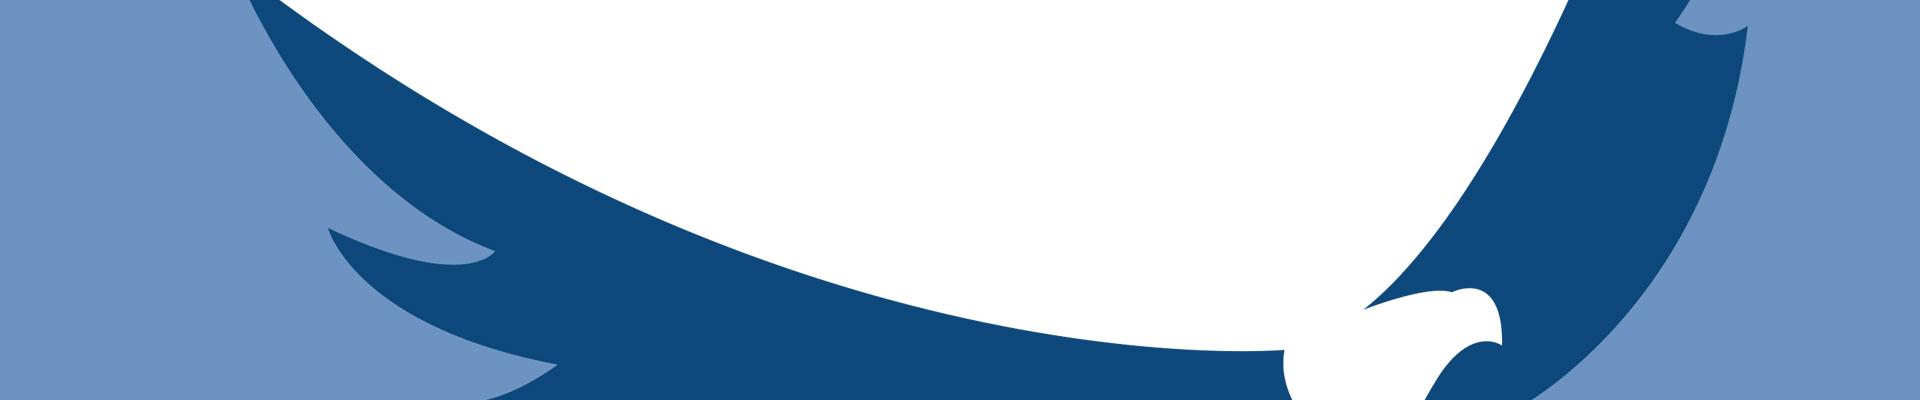 banner_empresa1